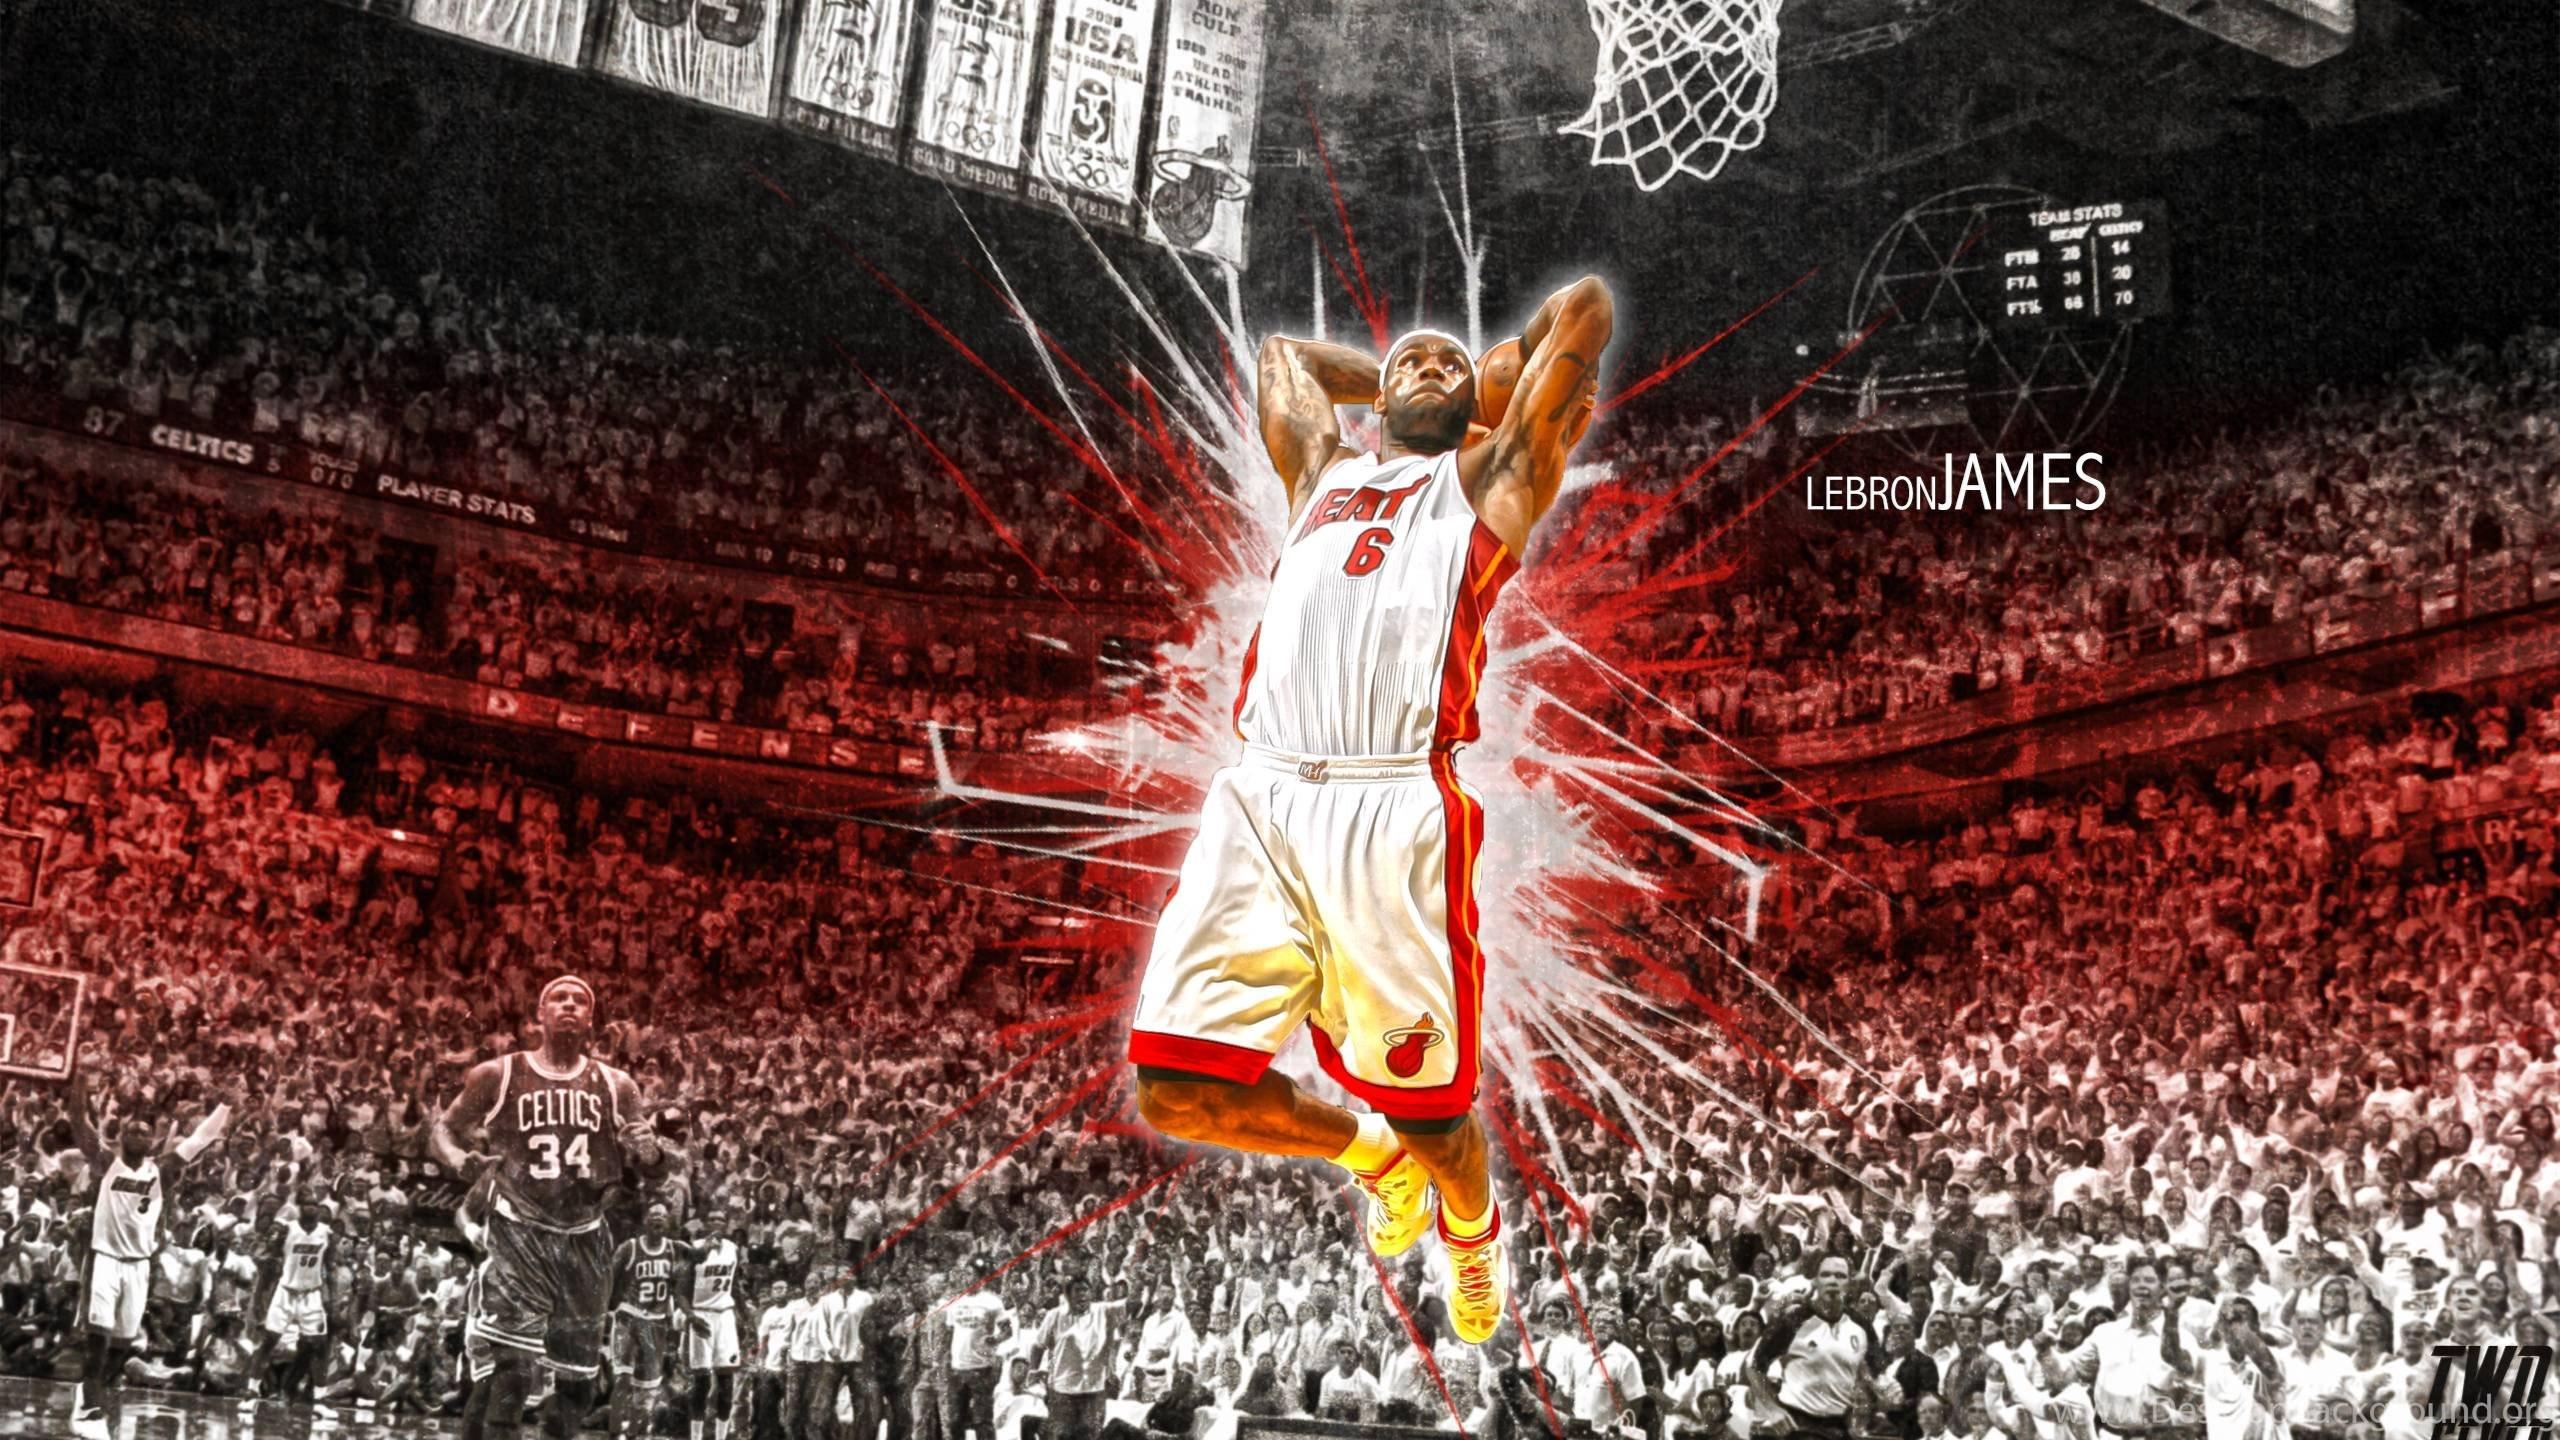 Lebron James Miami Heat Wallpapers For Desktop Background